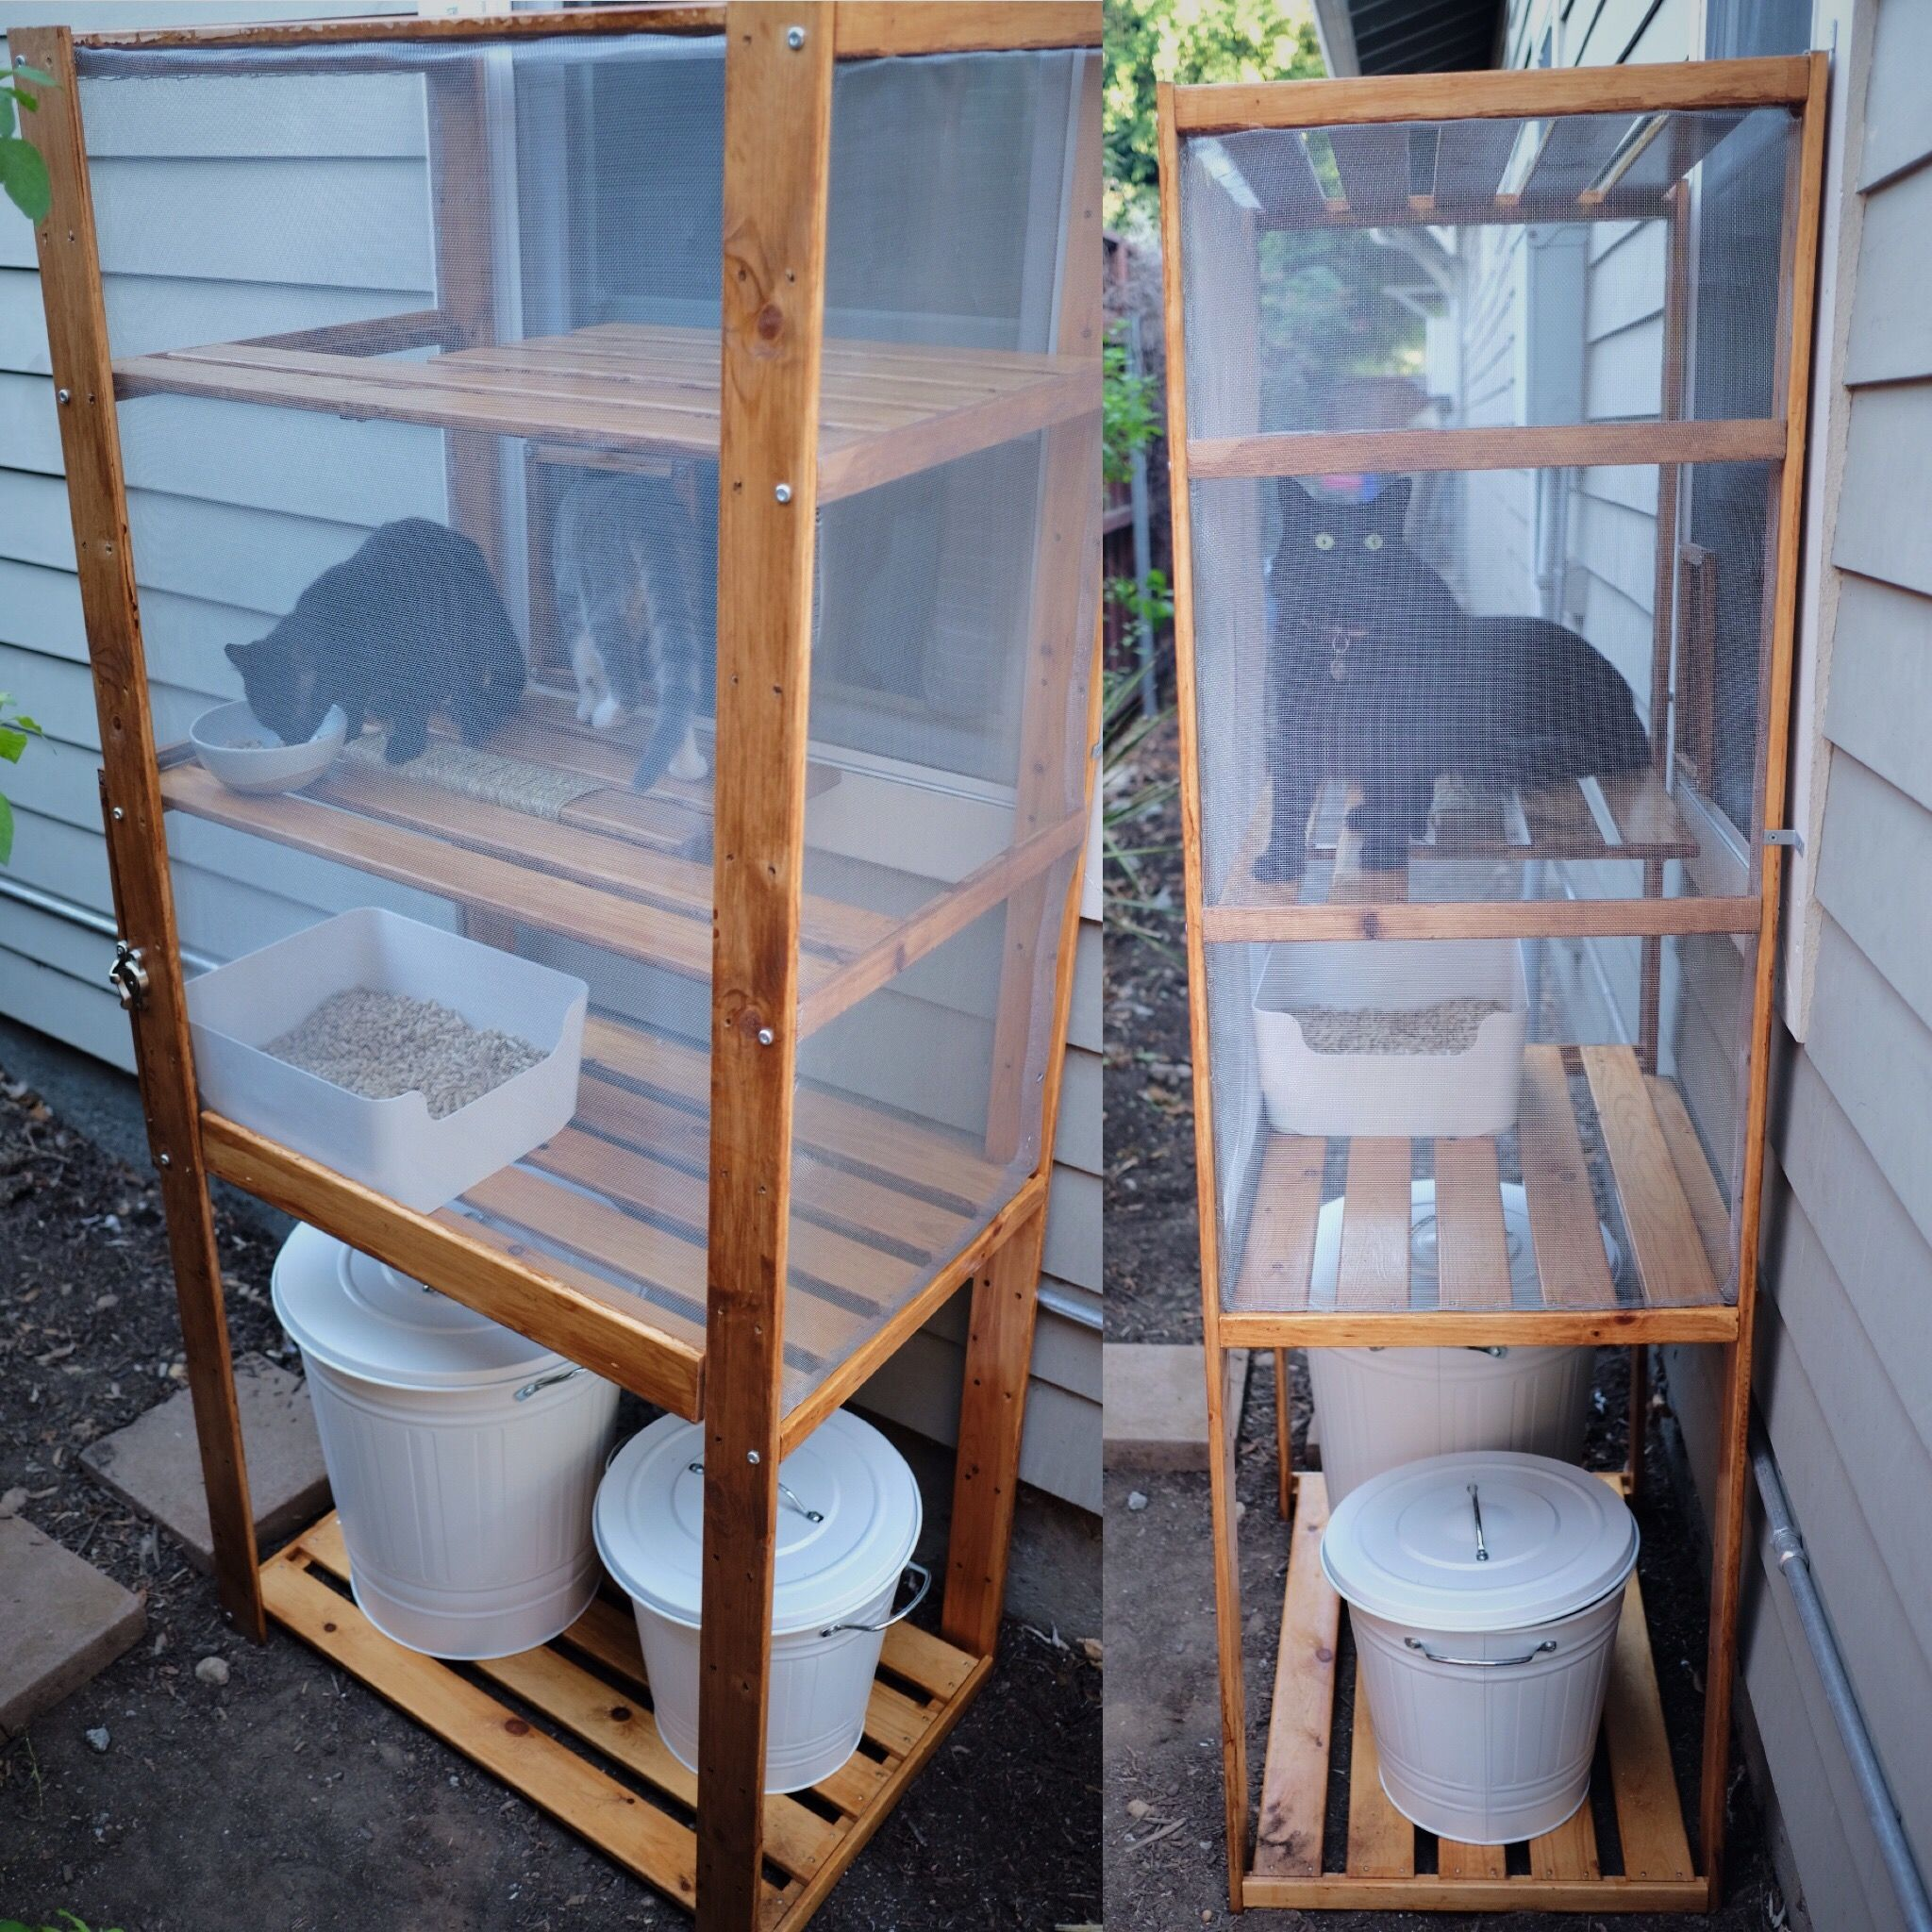 Diy Outdoor Cat Litter Box Catio Made Using An Ikea Hejne Shelf